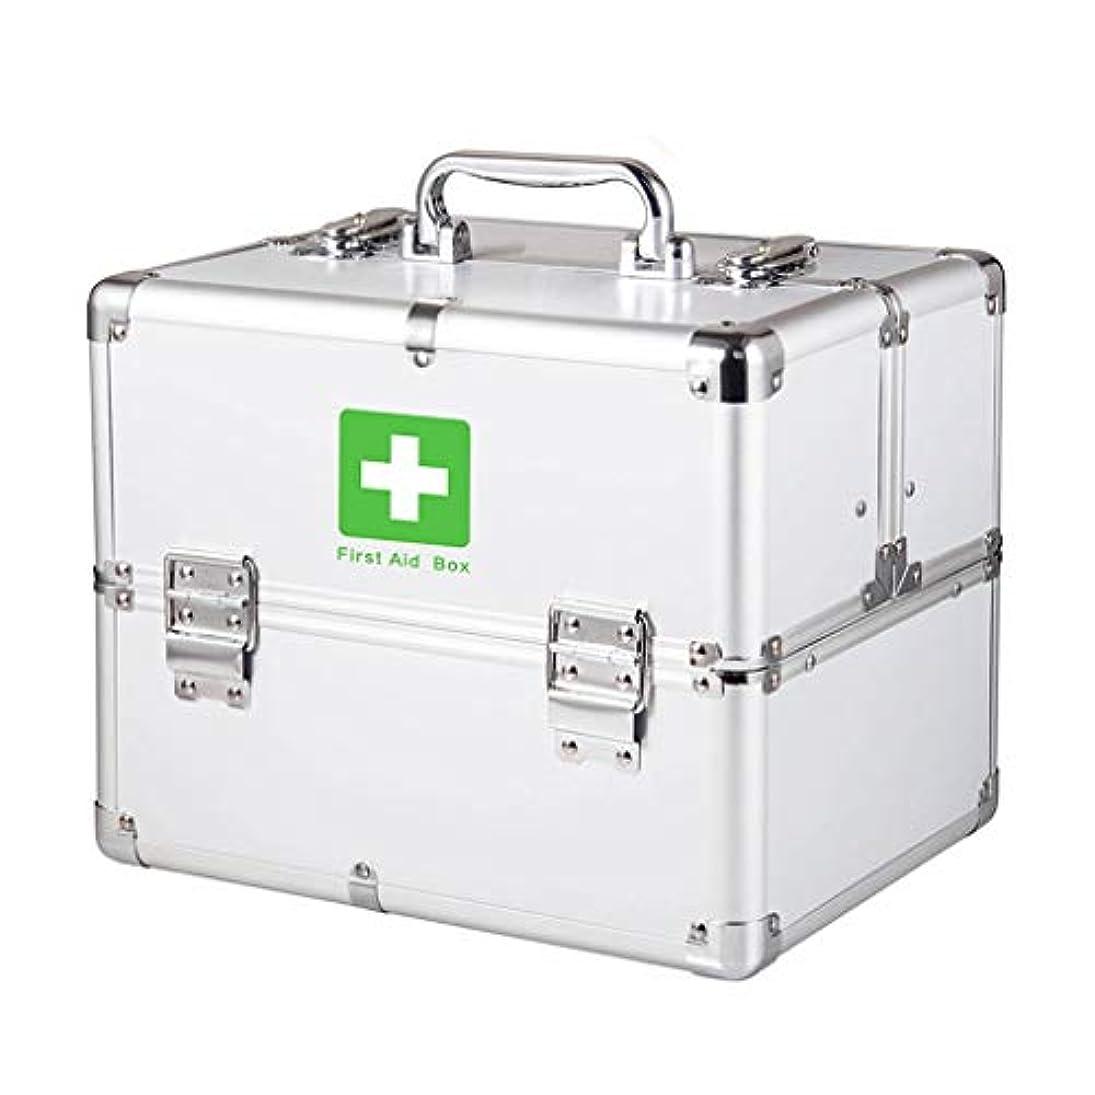 不透明な不正砂漠LLSDD 家庭用アルミ合金薬箱多層応急処置医療薬収納ボックス